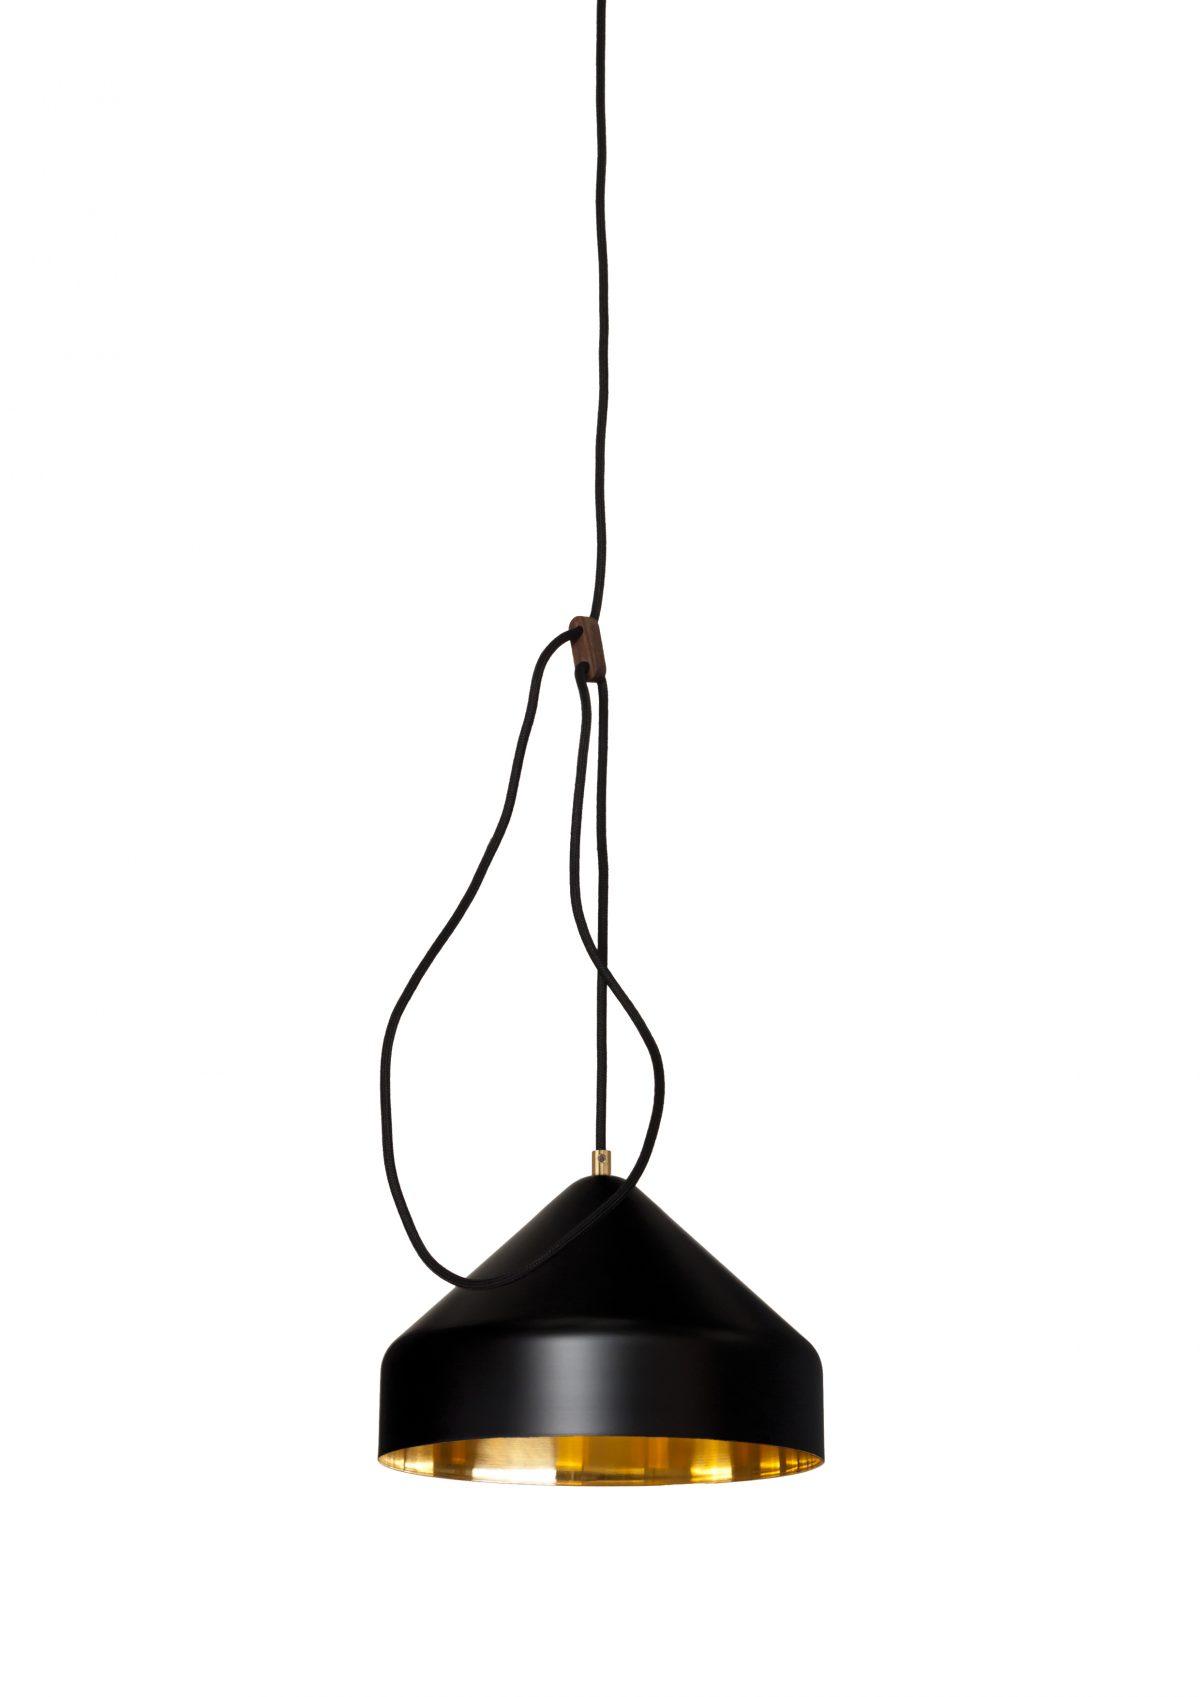 Llus lamp zwart messing Lloop brass black RAL9005 Ontwerpduo & Vij5 – Gimmii